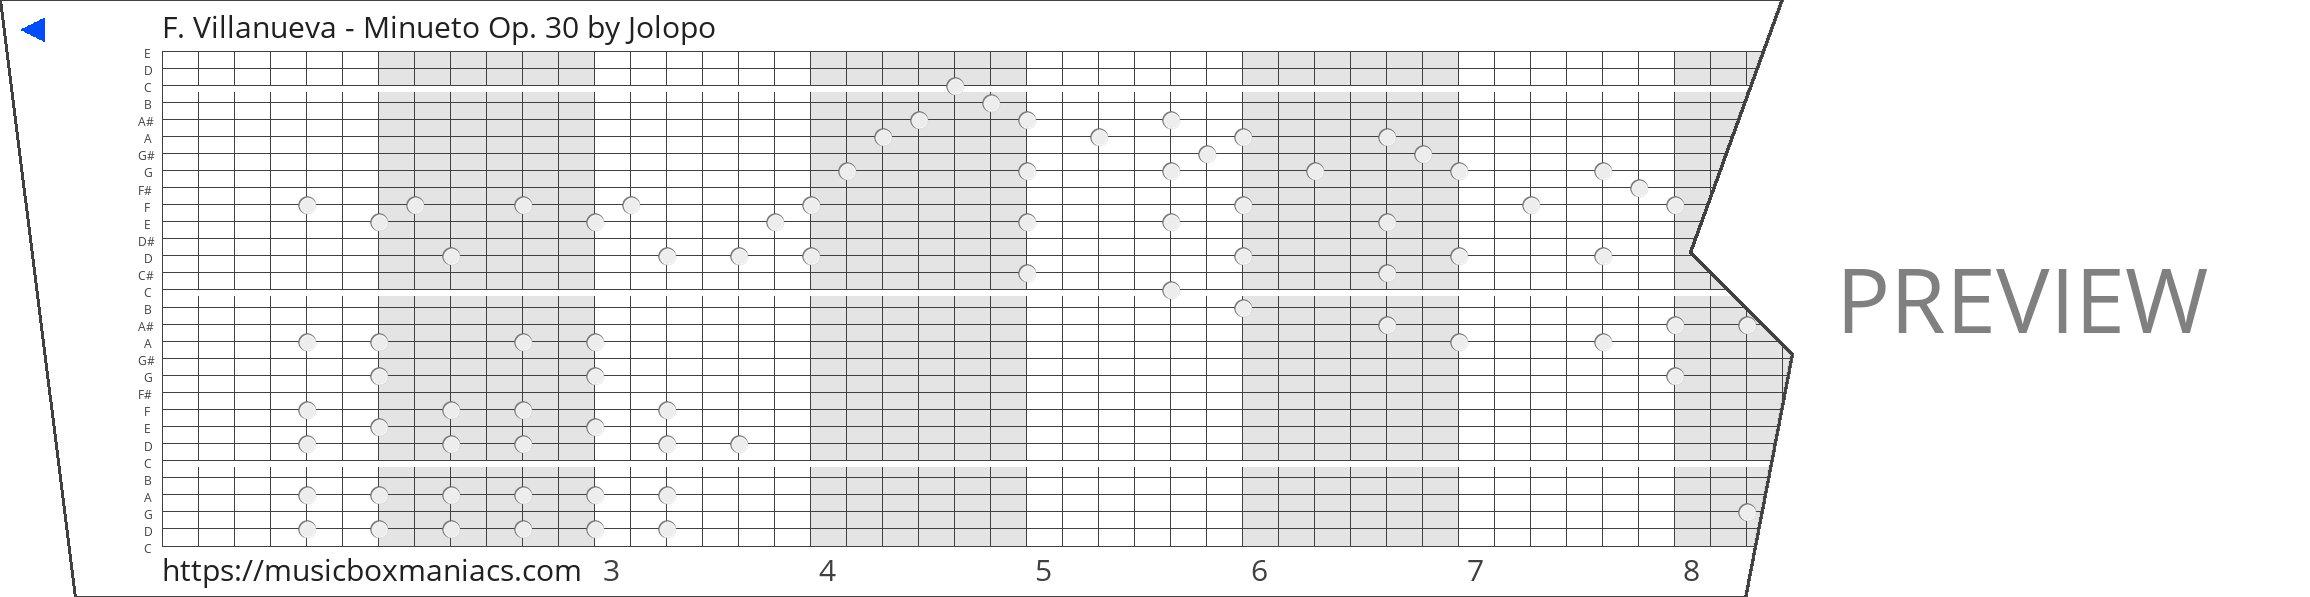 F. Villanueva - Minueto Op. 30 30 note music box paper strip